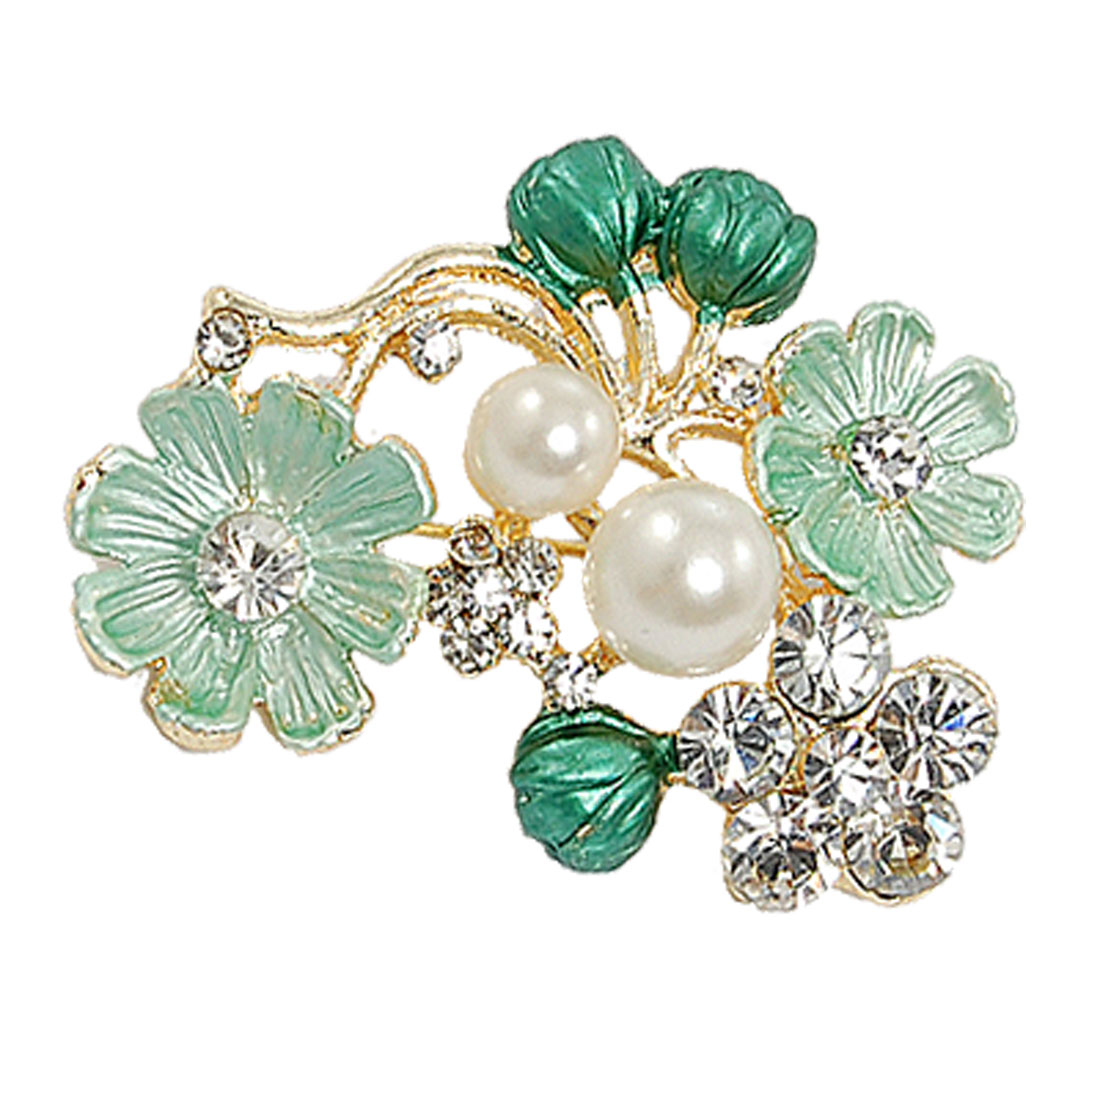 Glittery Rhinestone White Faux Pearl Cluster Green Flower Pin Brooch